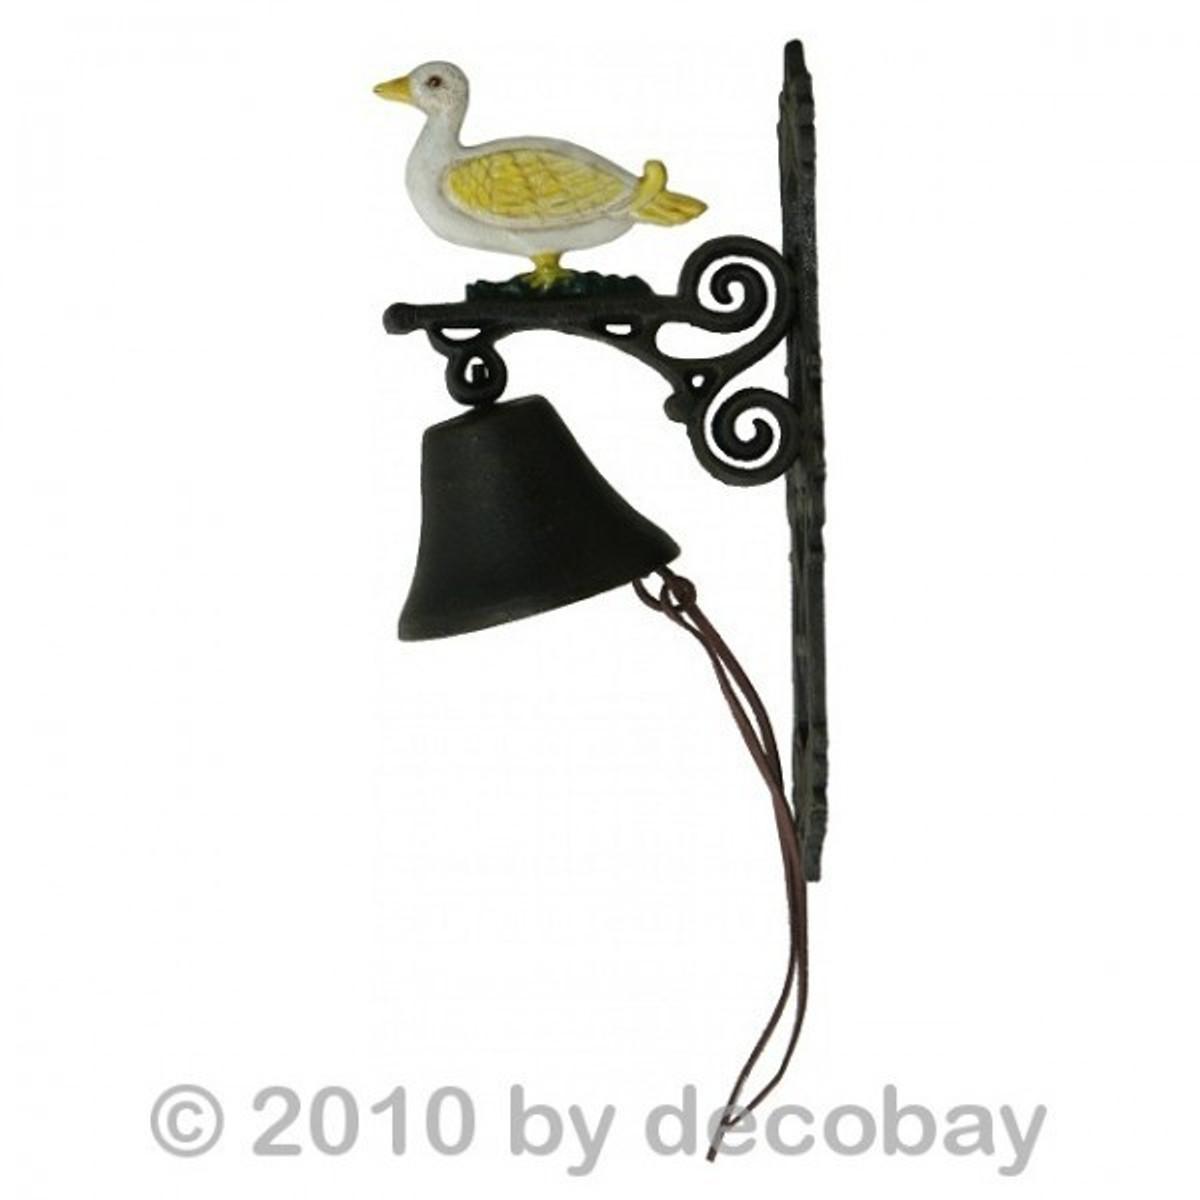 Gusseisen Glocke Ente Motiv Hauseingang Klingel Garten Deko bei uns sogar online im Shop bestellbar.